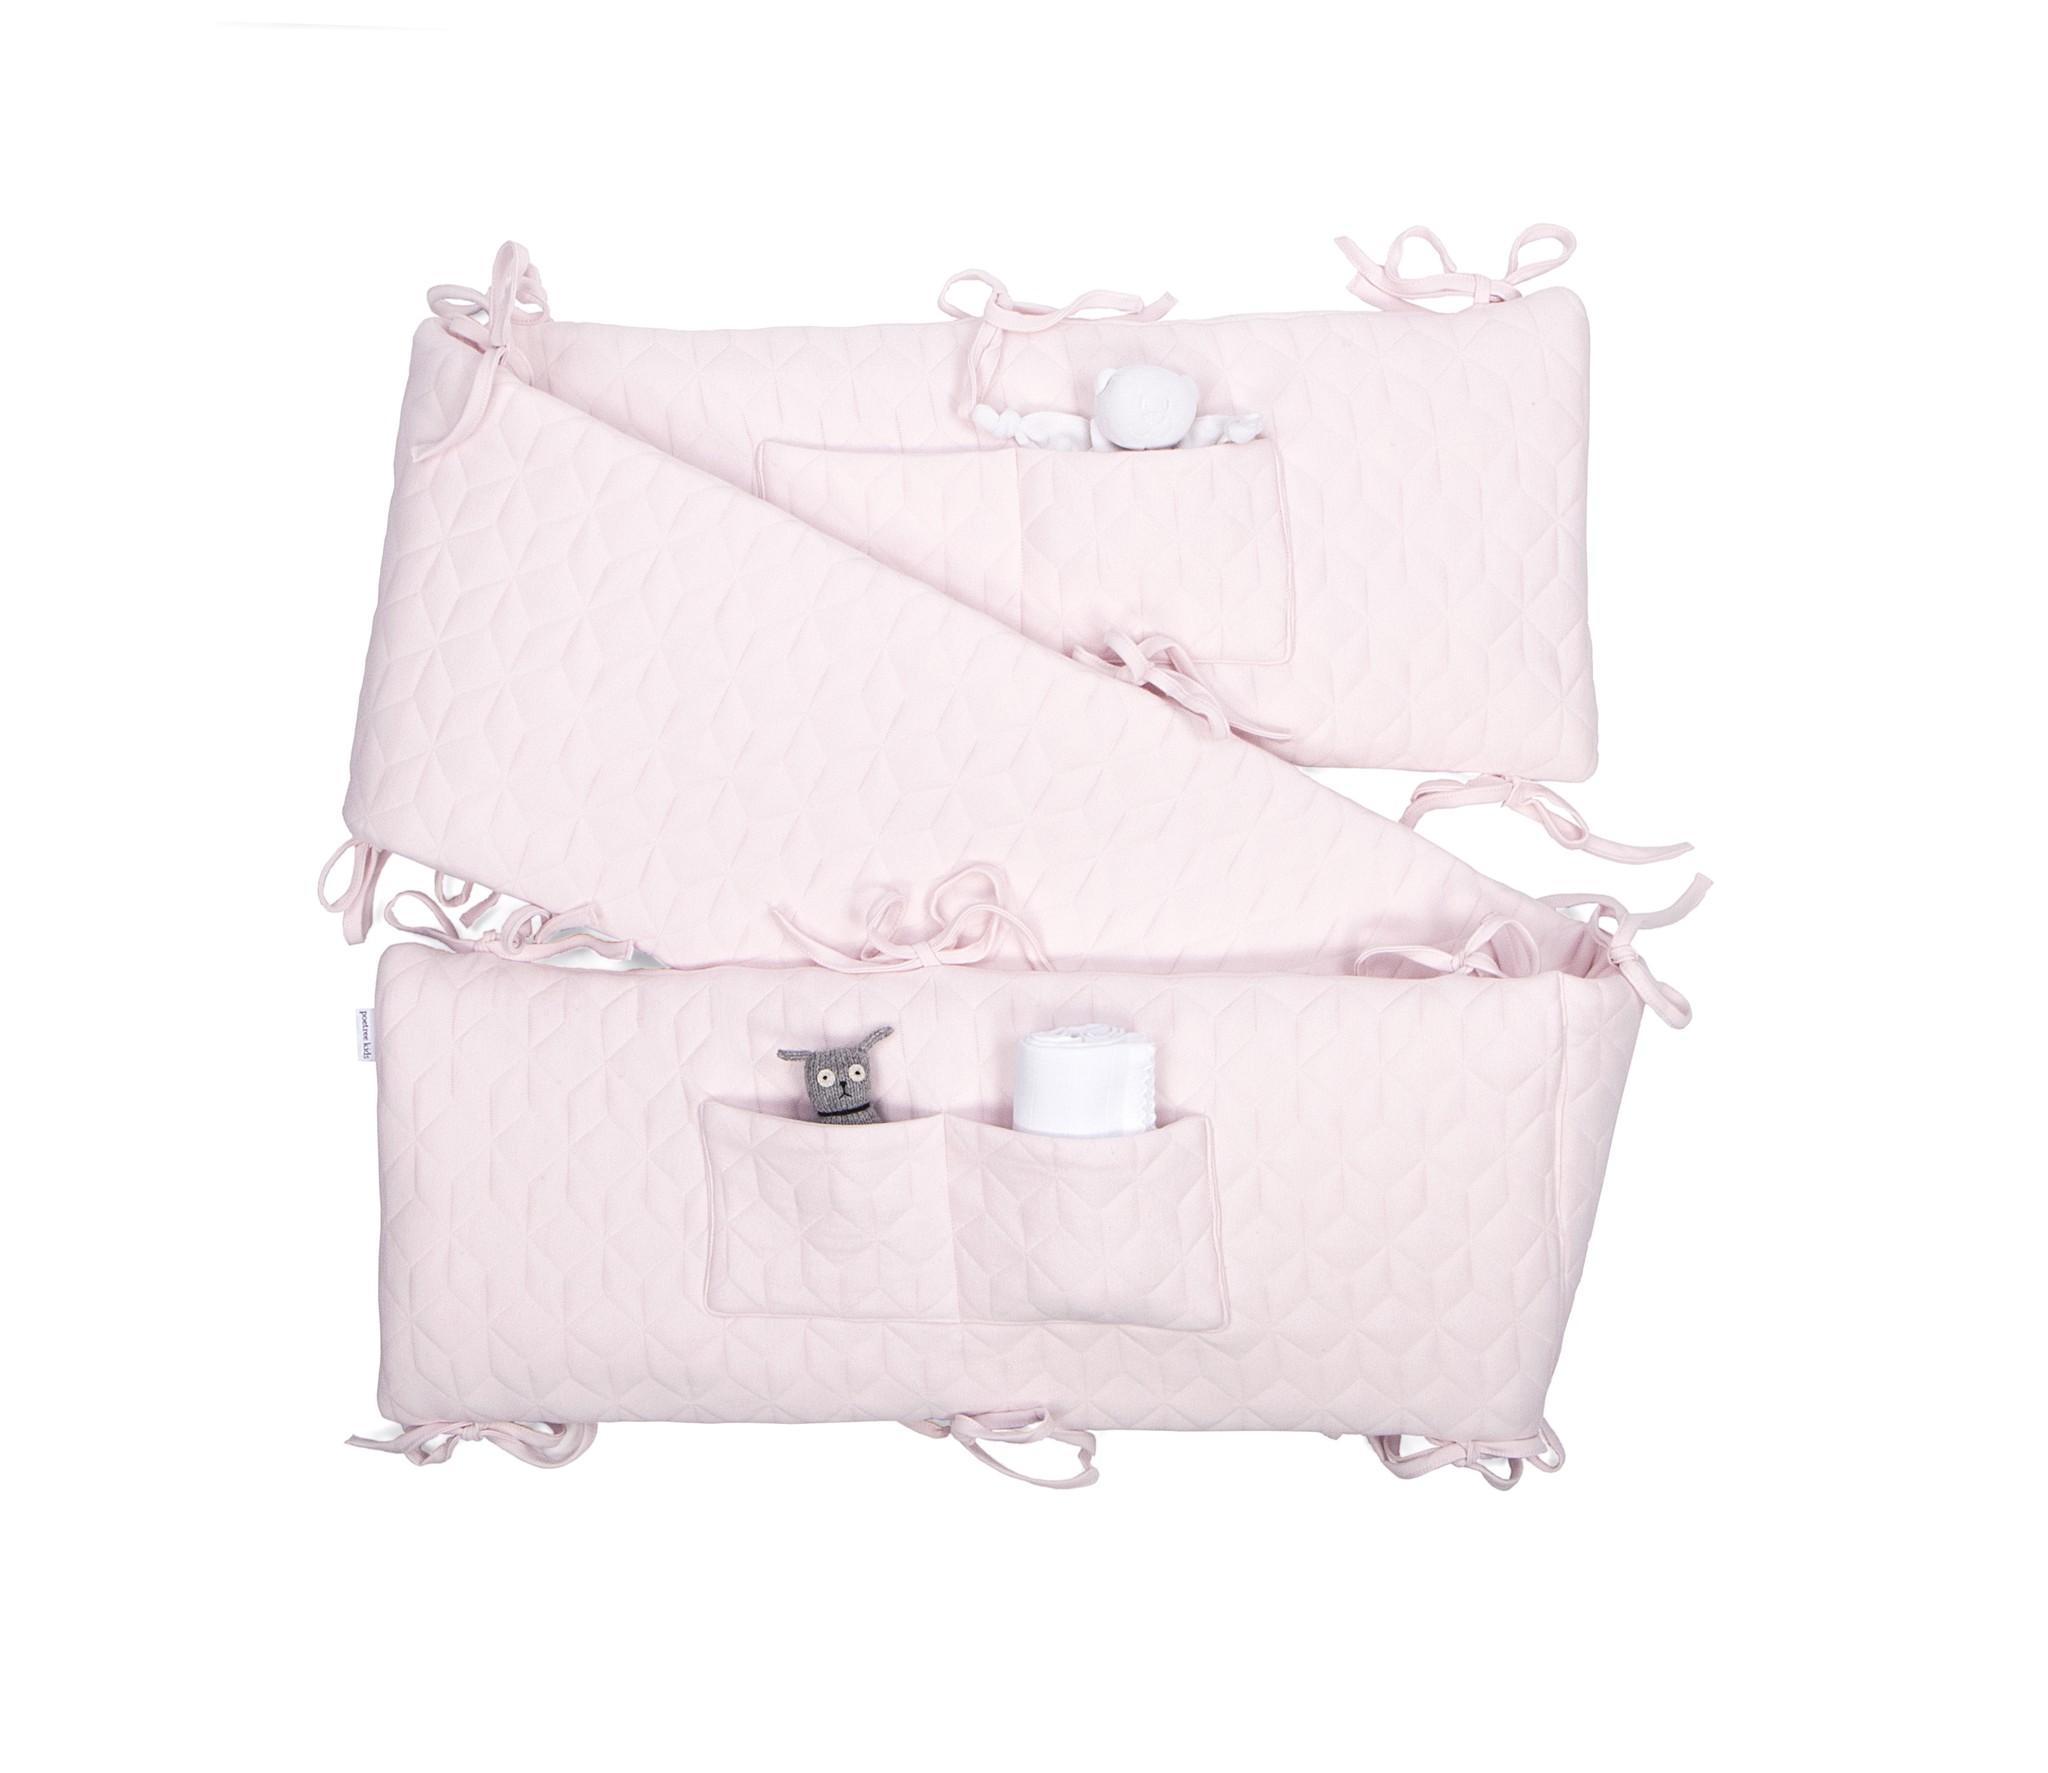 Boxomrander Star Soft Pink-5